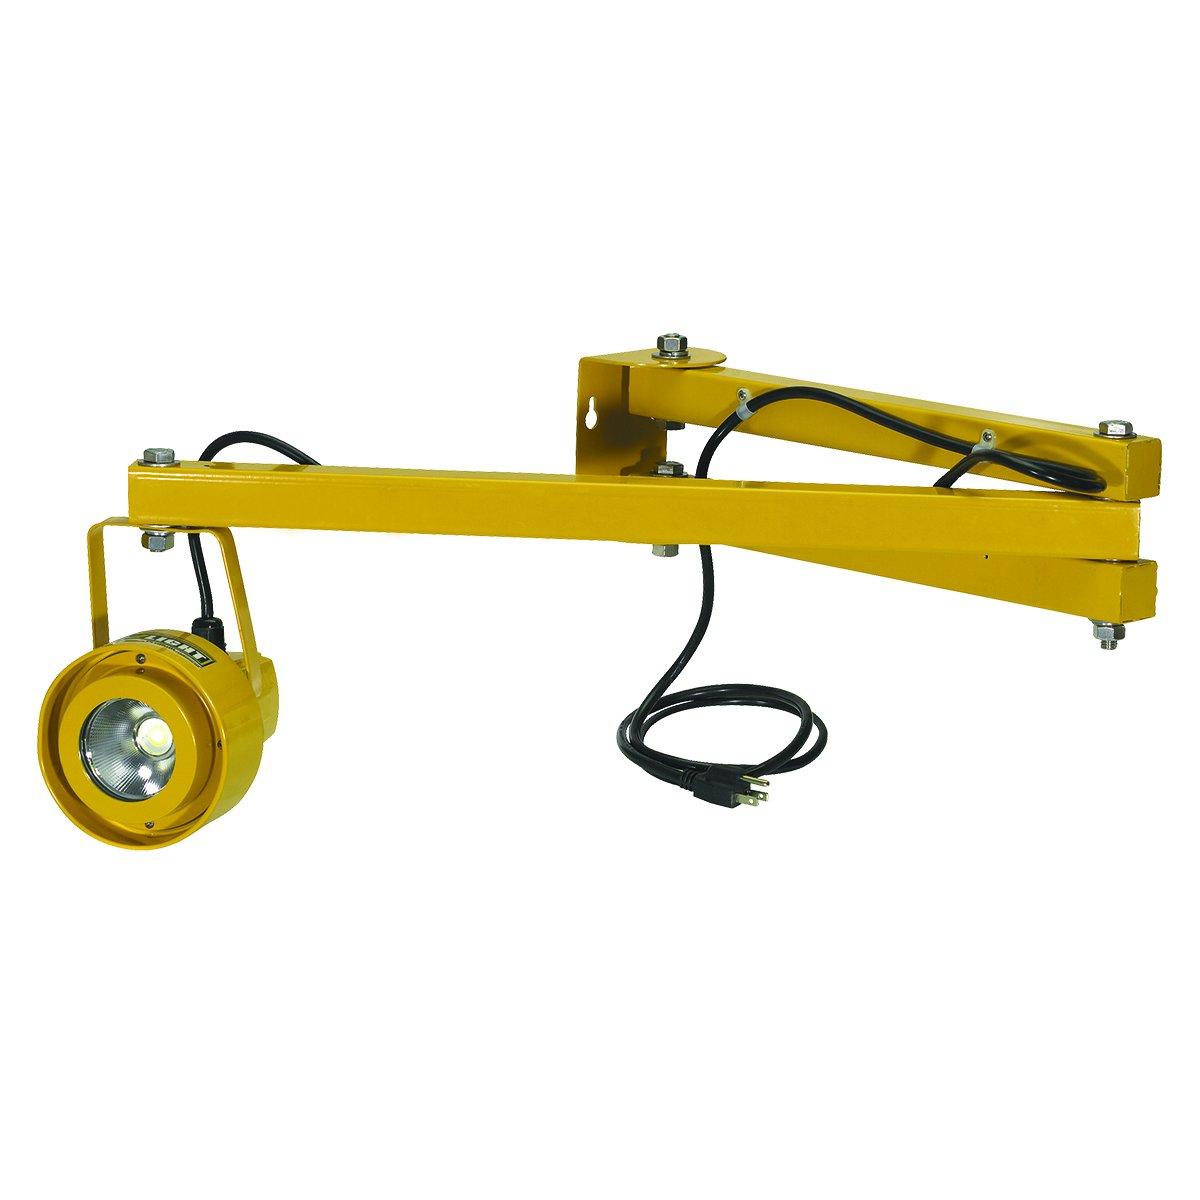 ProLight 111510 LED Dock Light 1,700 Lumens, 40', Yellow